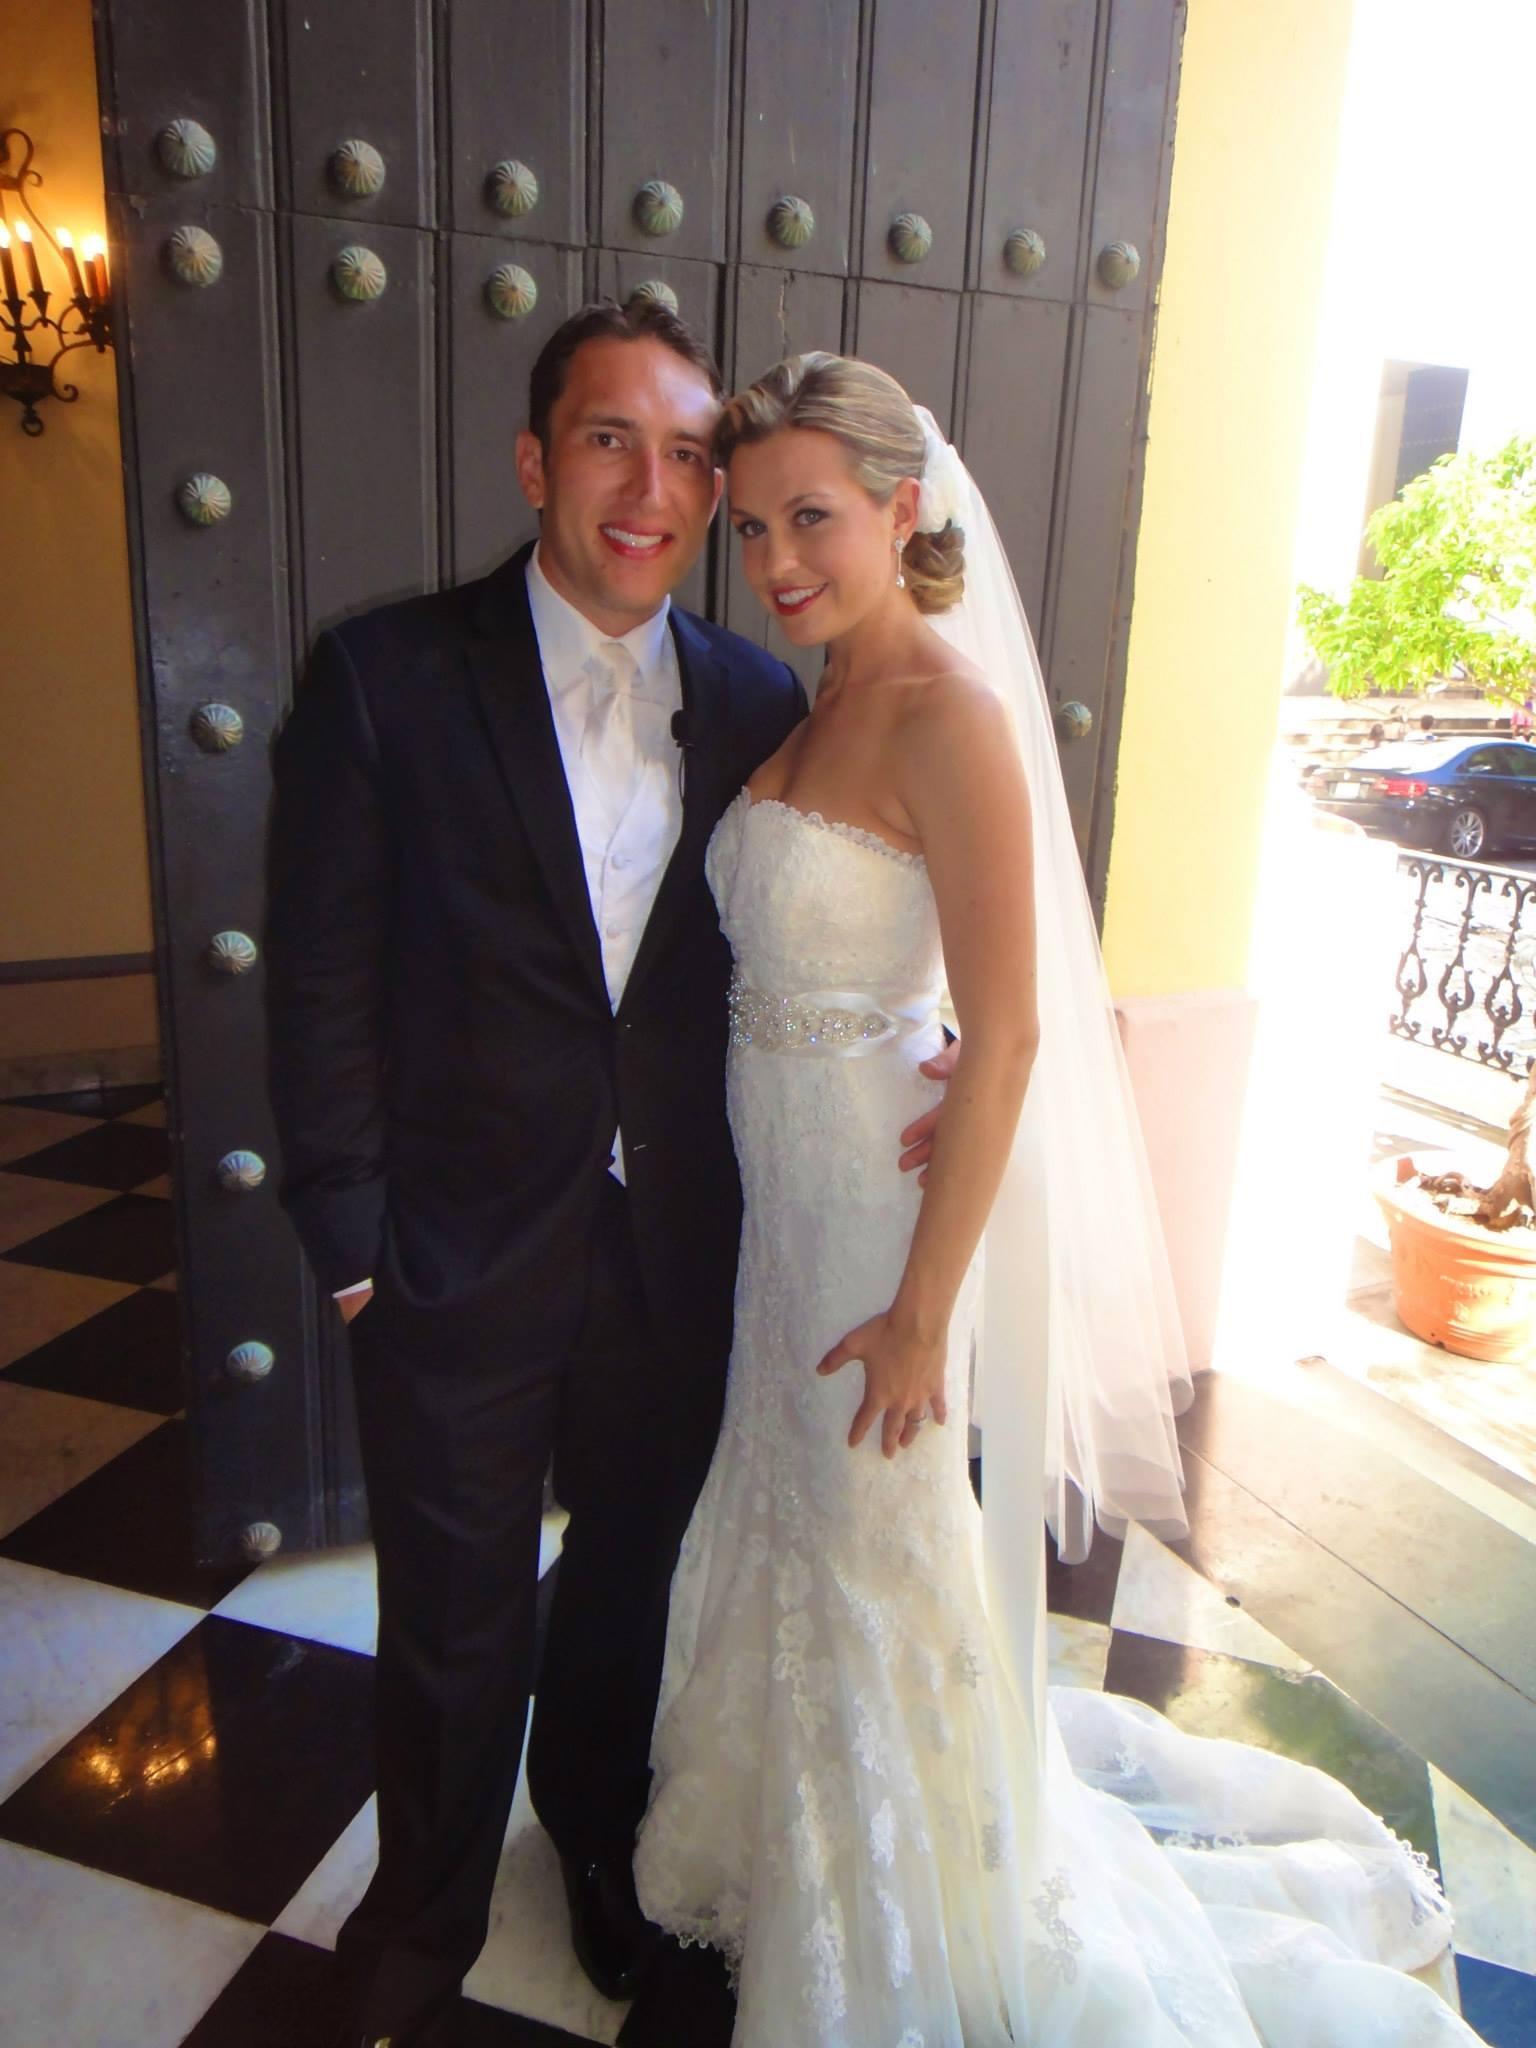 HSN Host Colleen Lopez's Son's Wedding Album  Homeshoppingista's